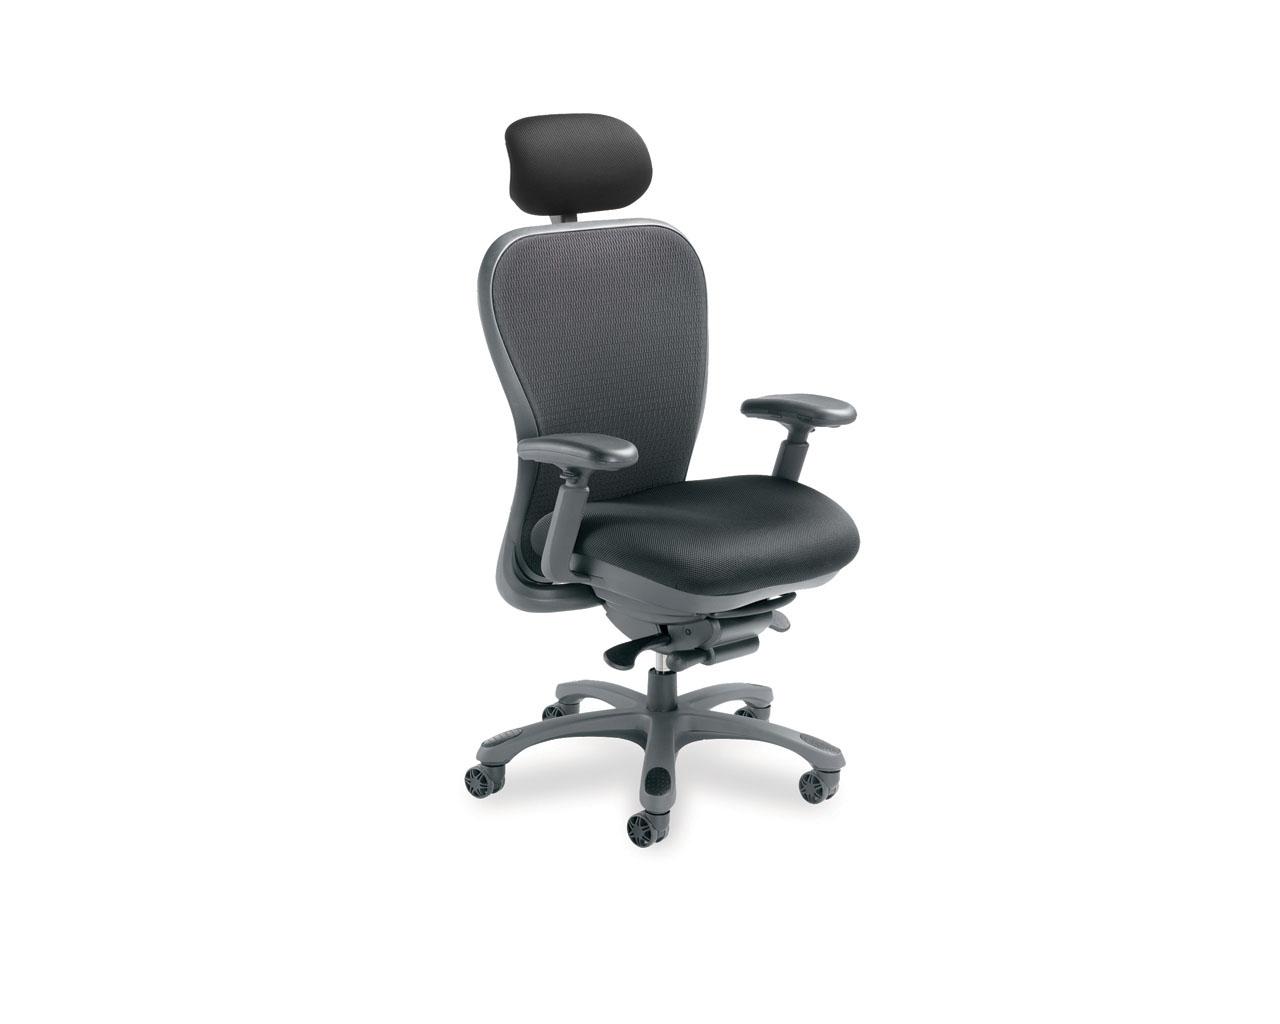 CXO Ergonomic Chair with Headrest